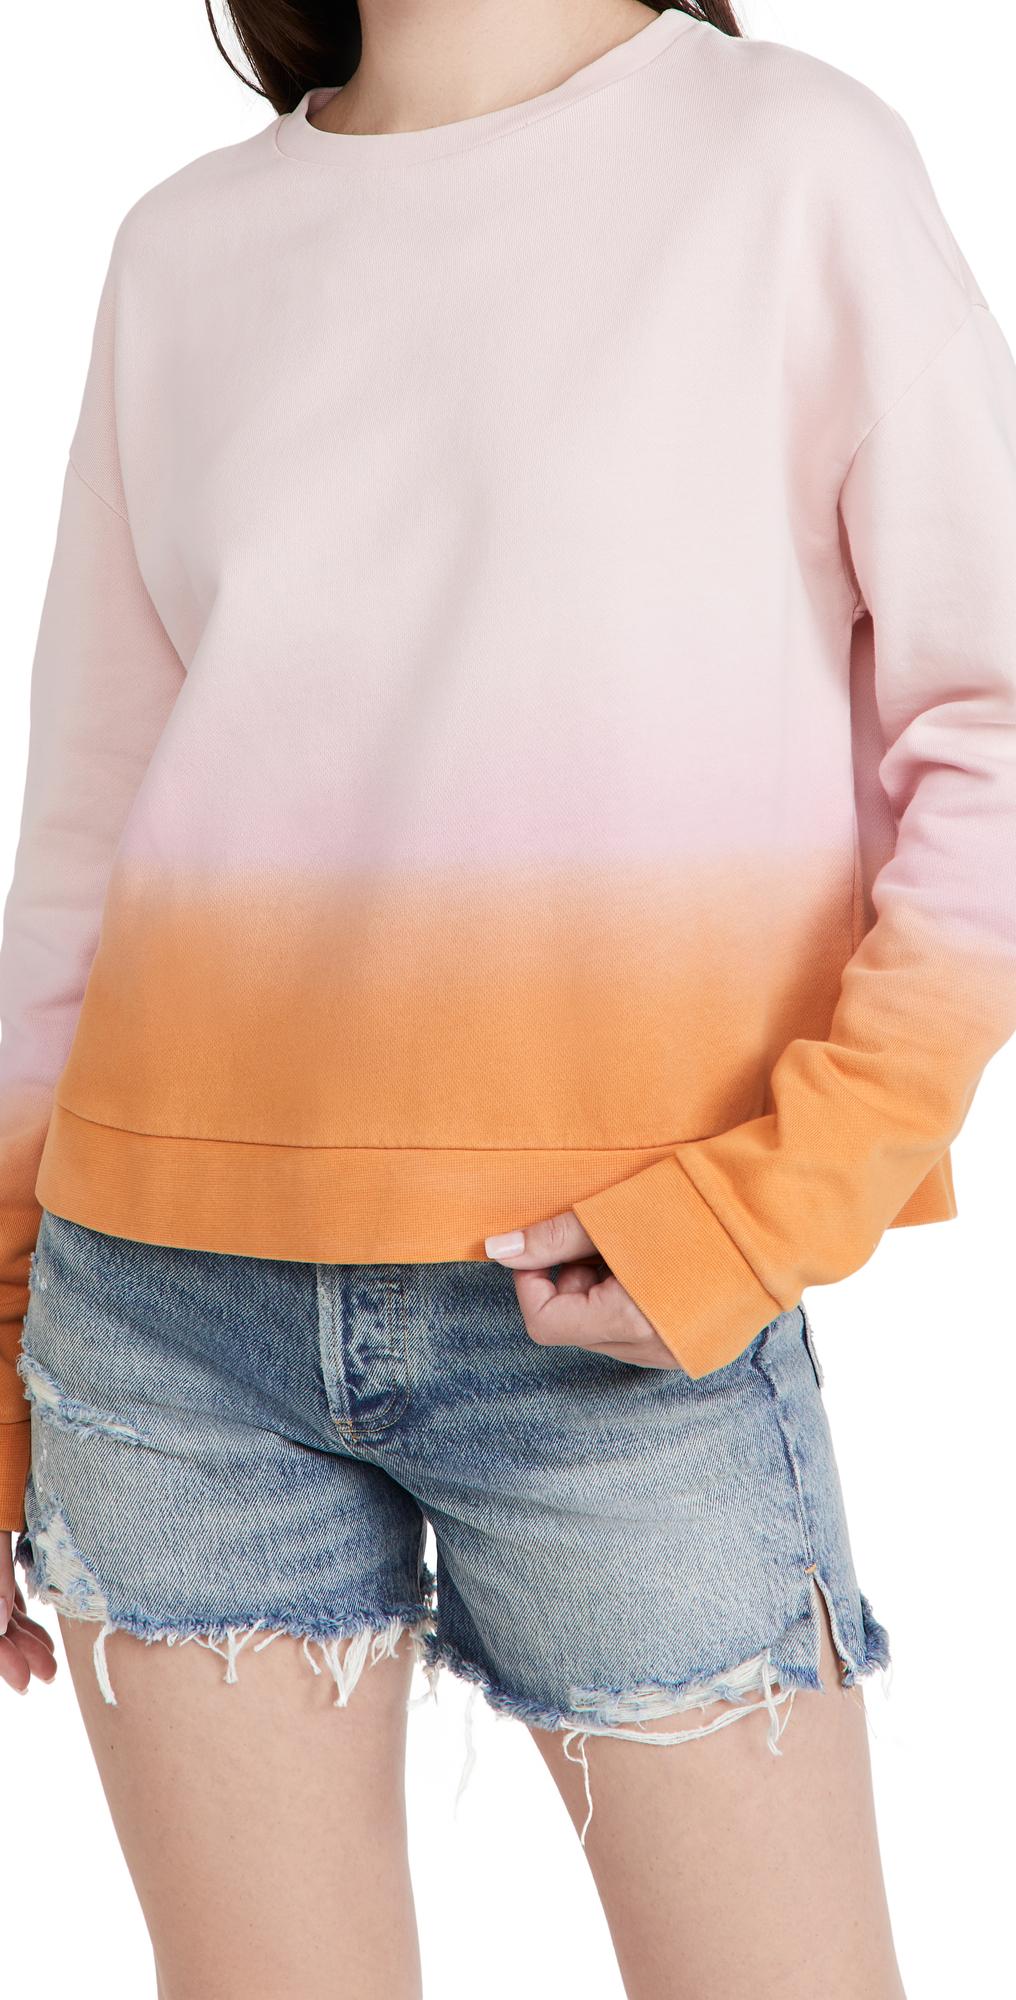 The Summer Sweatshirt